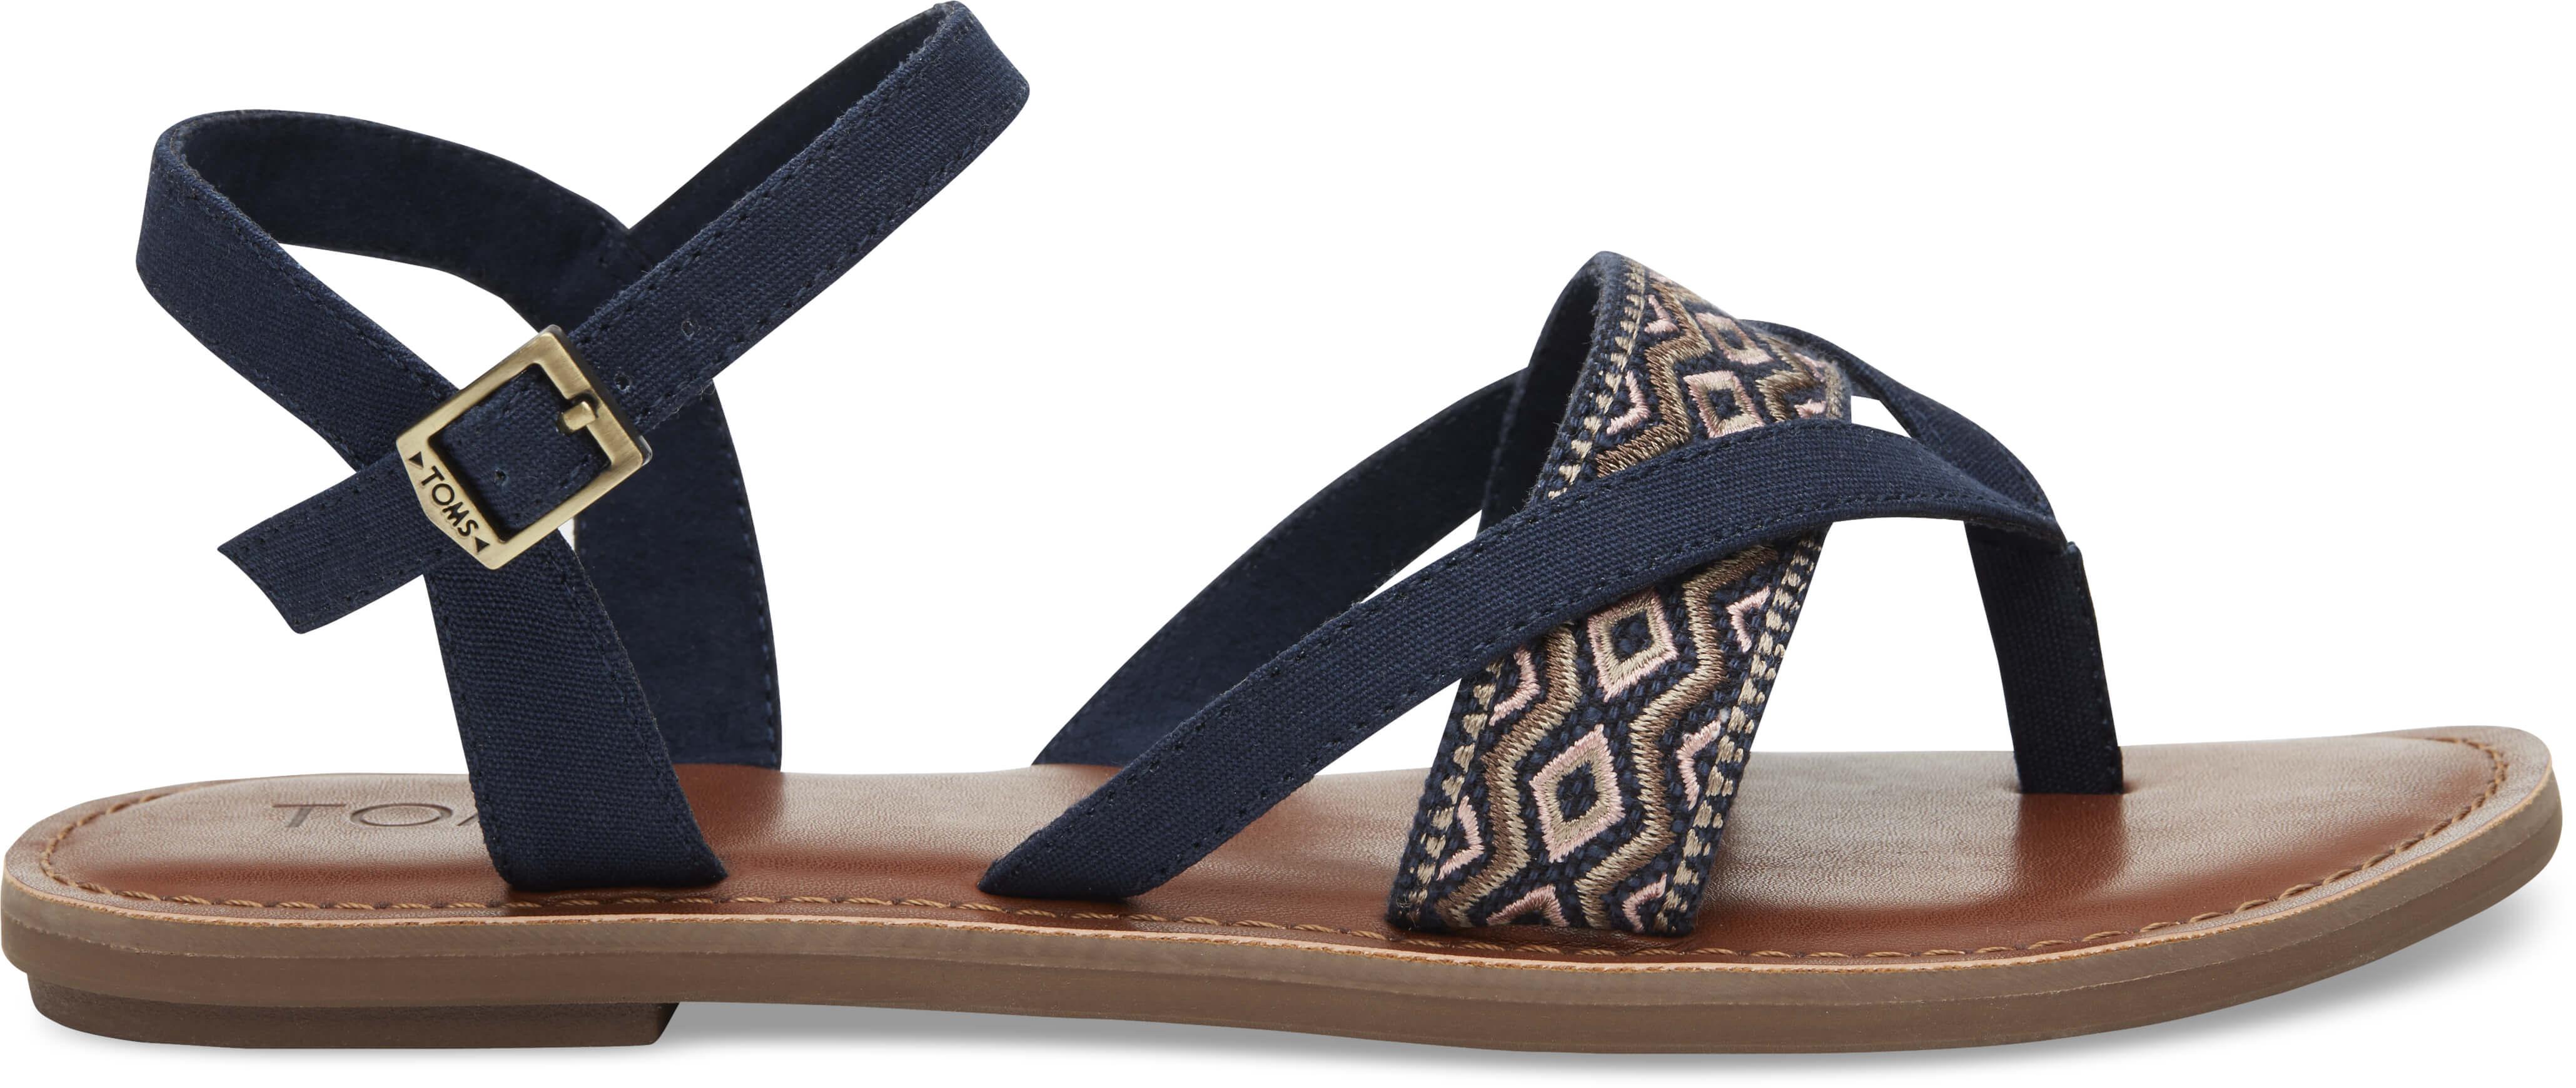 TOMS Dámské tmavě modré páskové sandále Navy Canvas Embroidery Lexie Sandals 8d074ab834f